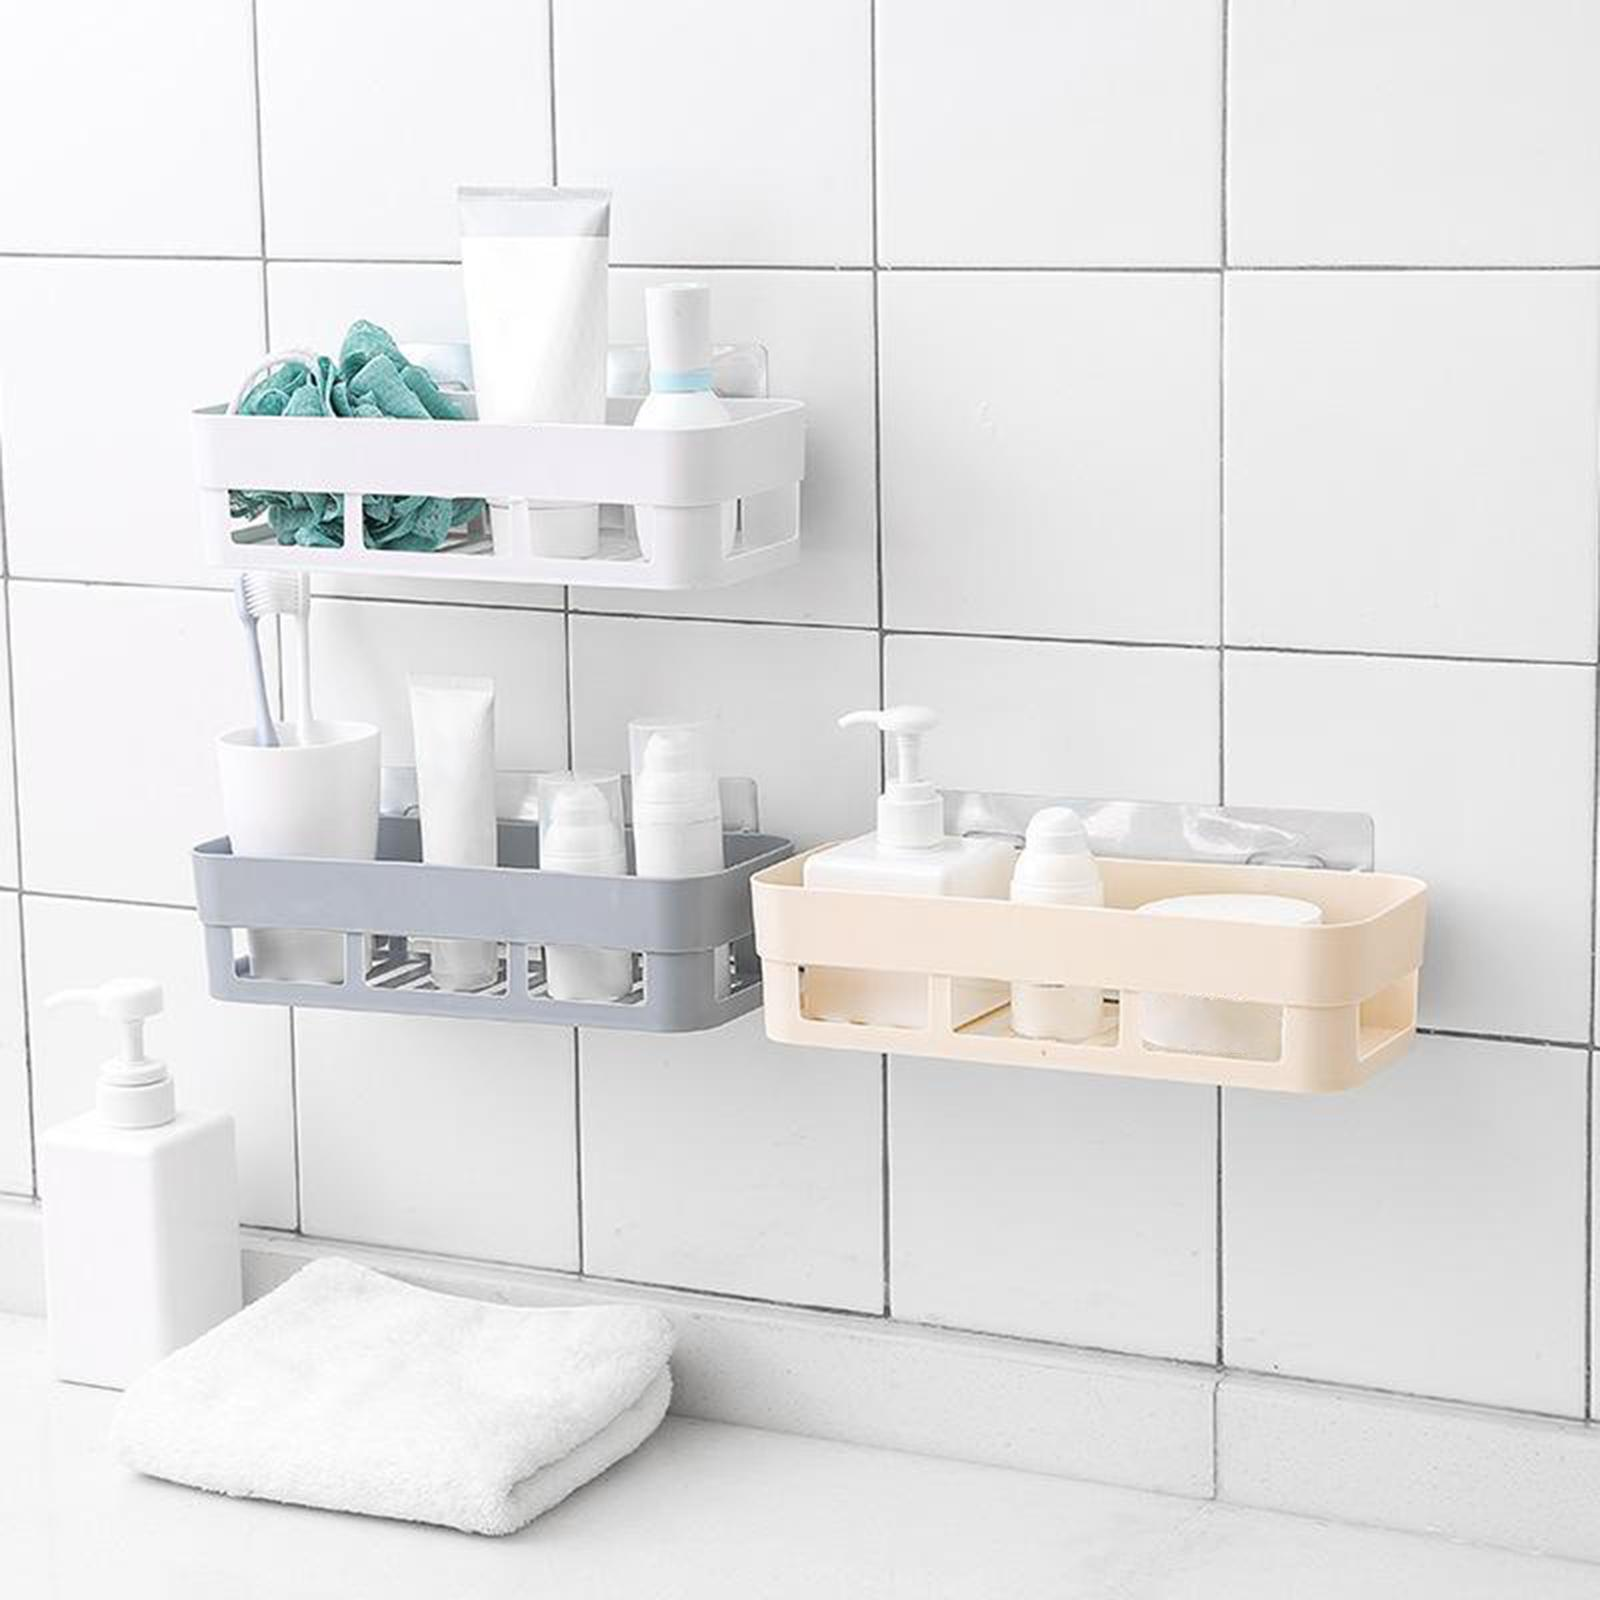 thumbnail 9 - Wall-Suction-Bathroom-Shelf-Shower-Caddy-Wall-Mount-Storage-Rack-Organizer